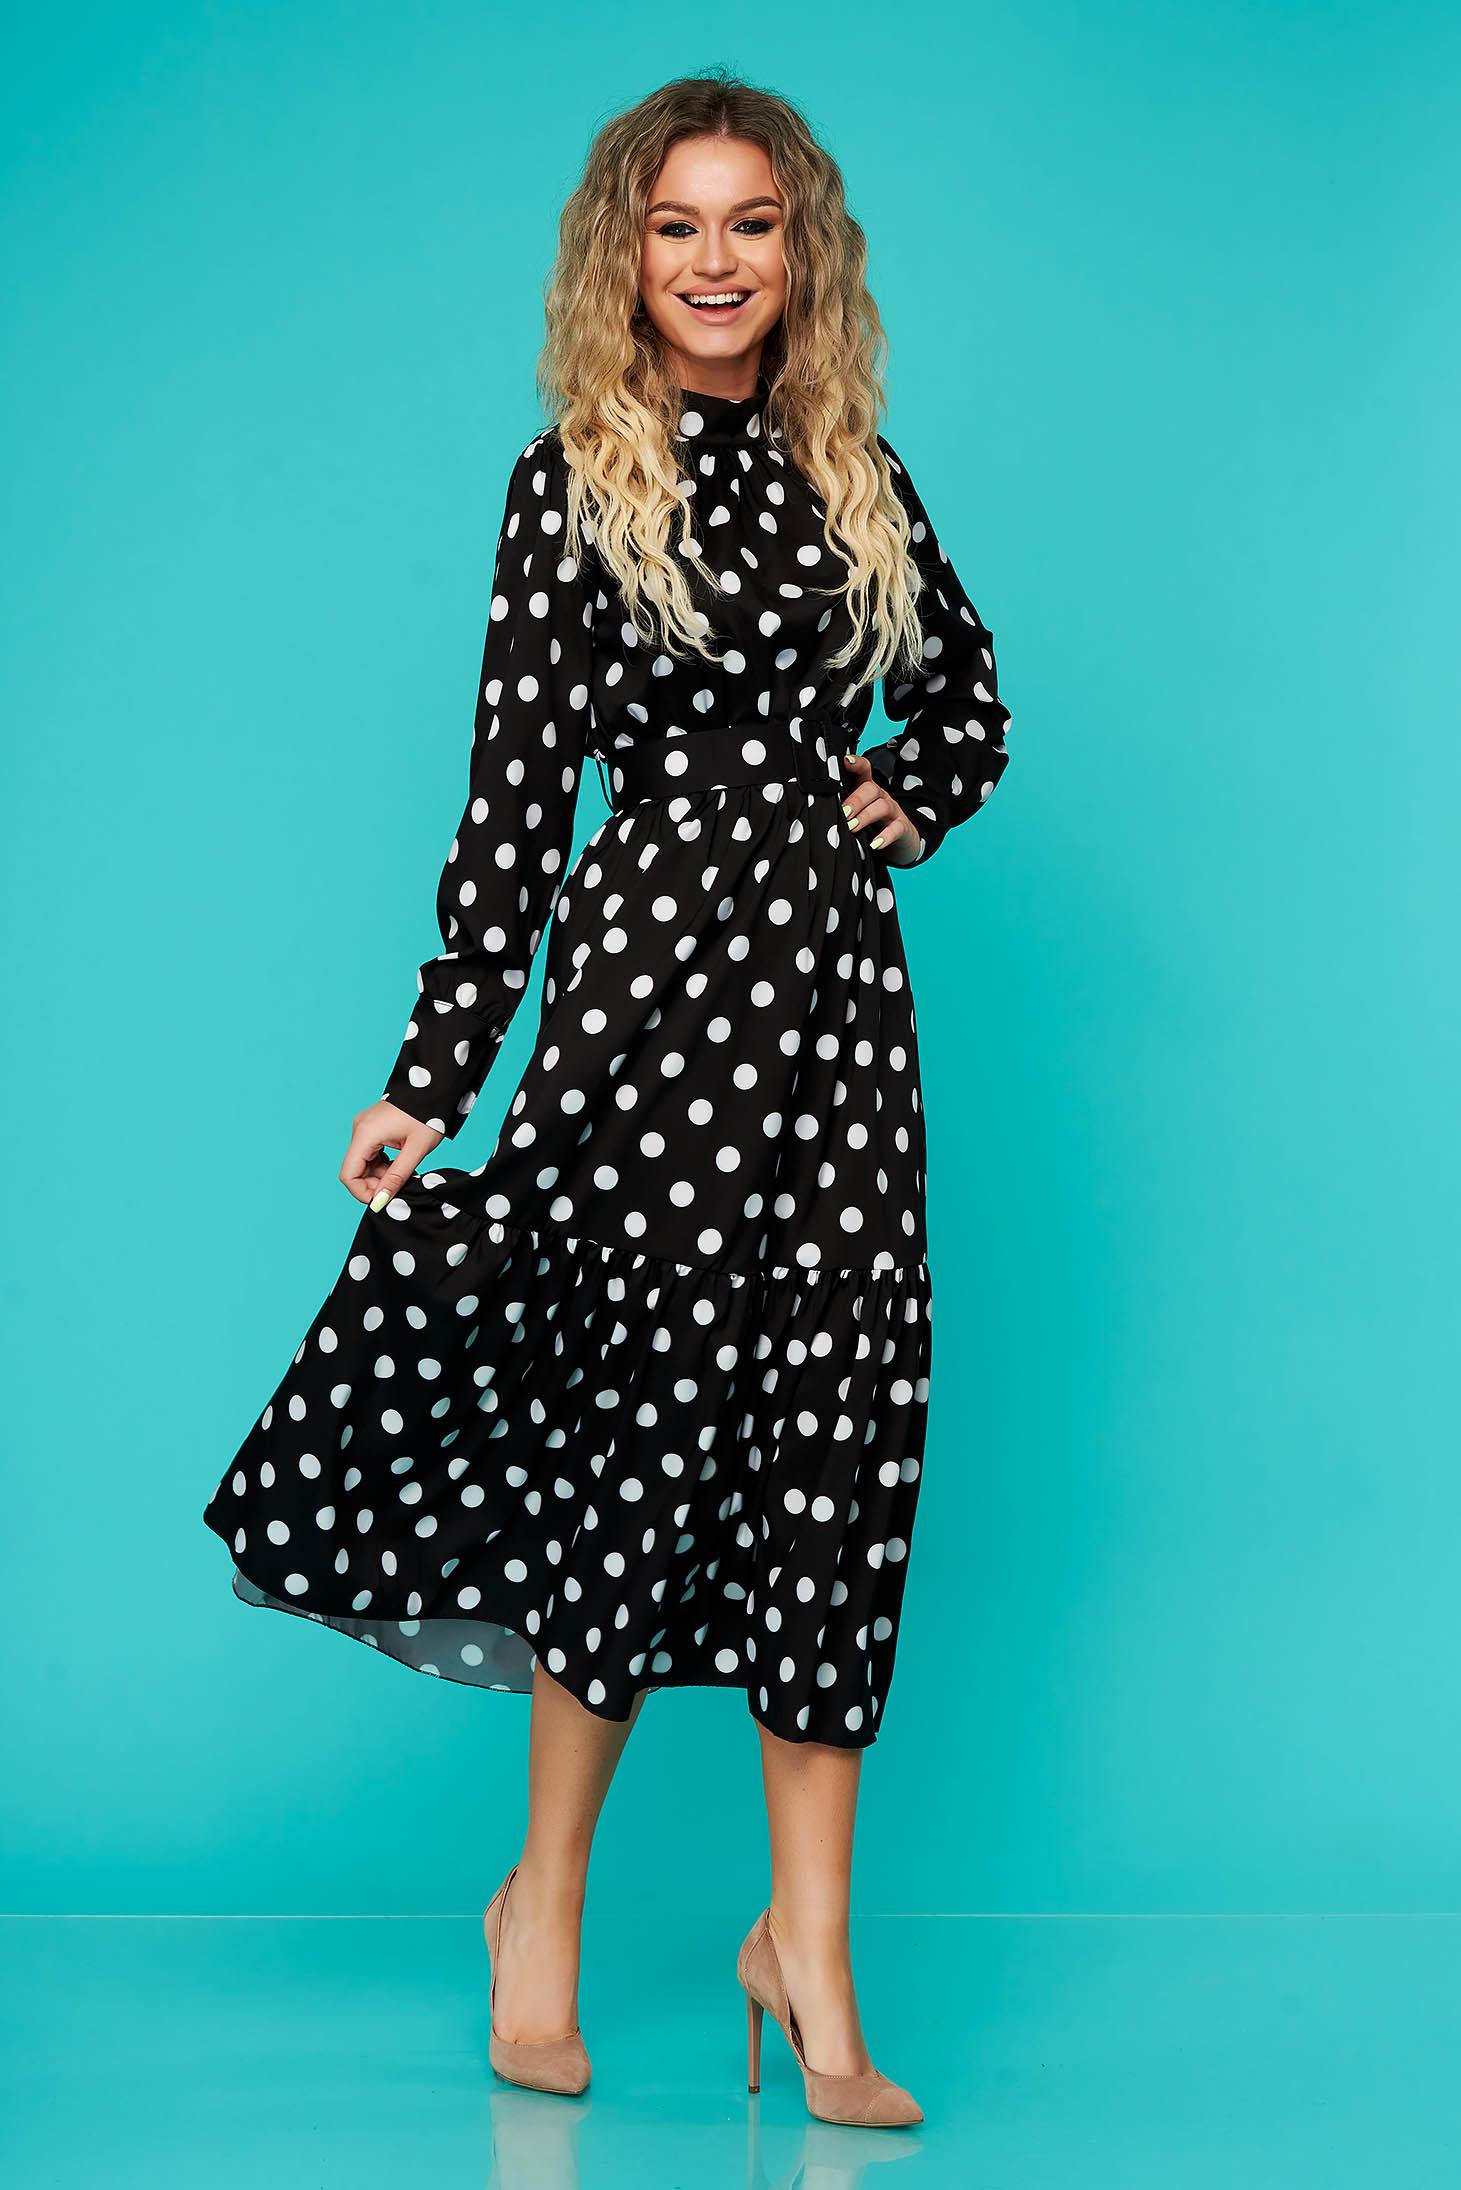 Rochie SunShine neagra de zi midi cu elastic in talie cu accesoriu tip curea cu volanase la baza rochiei